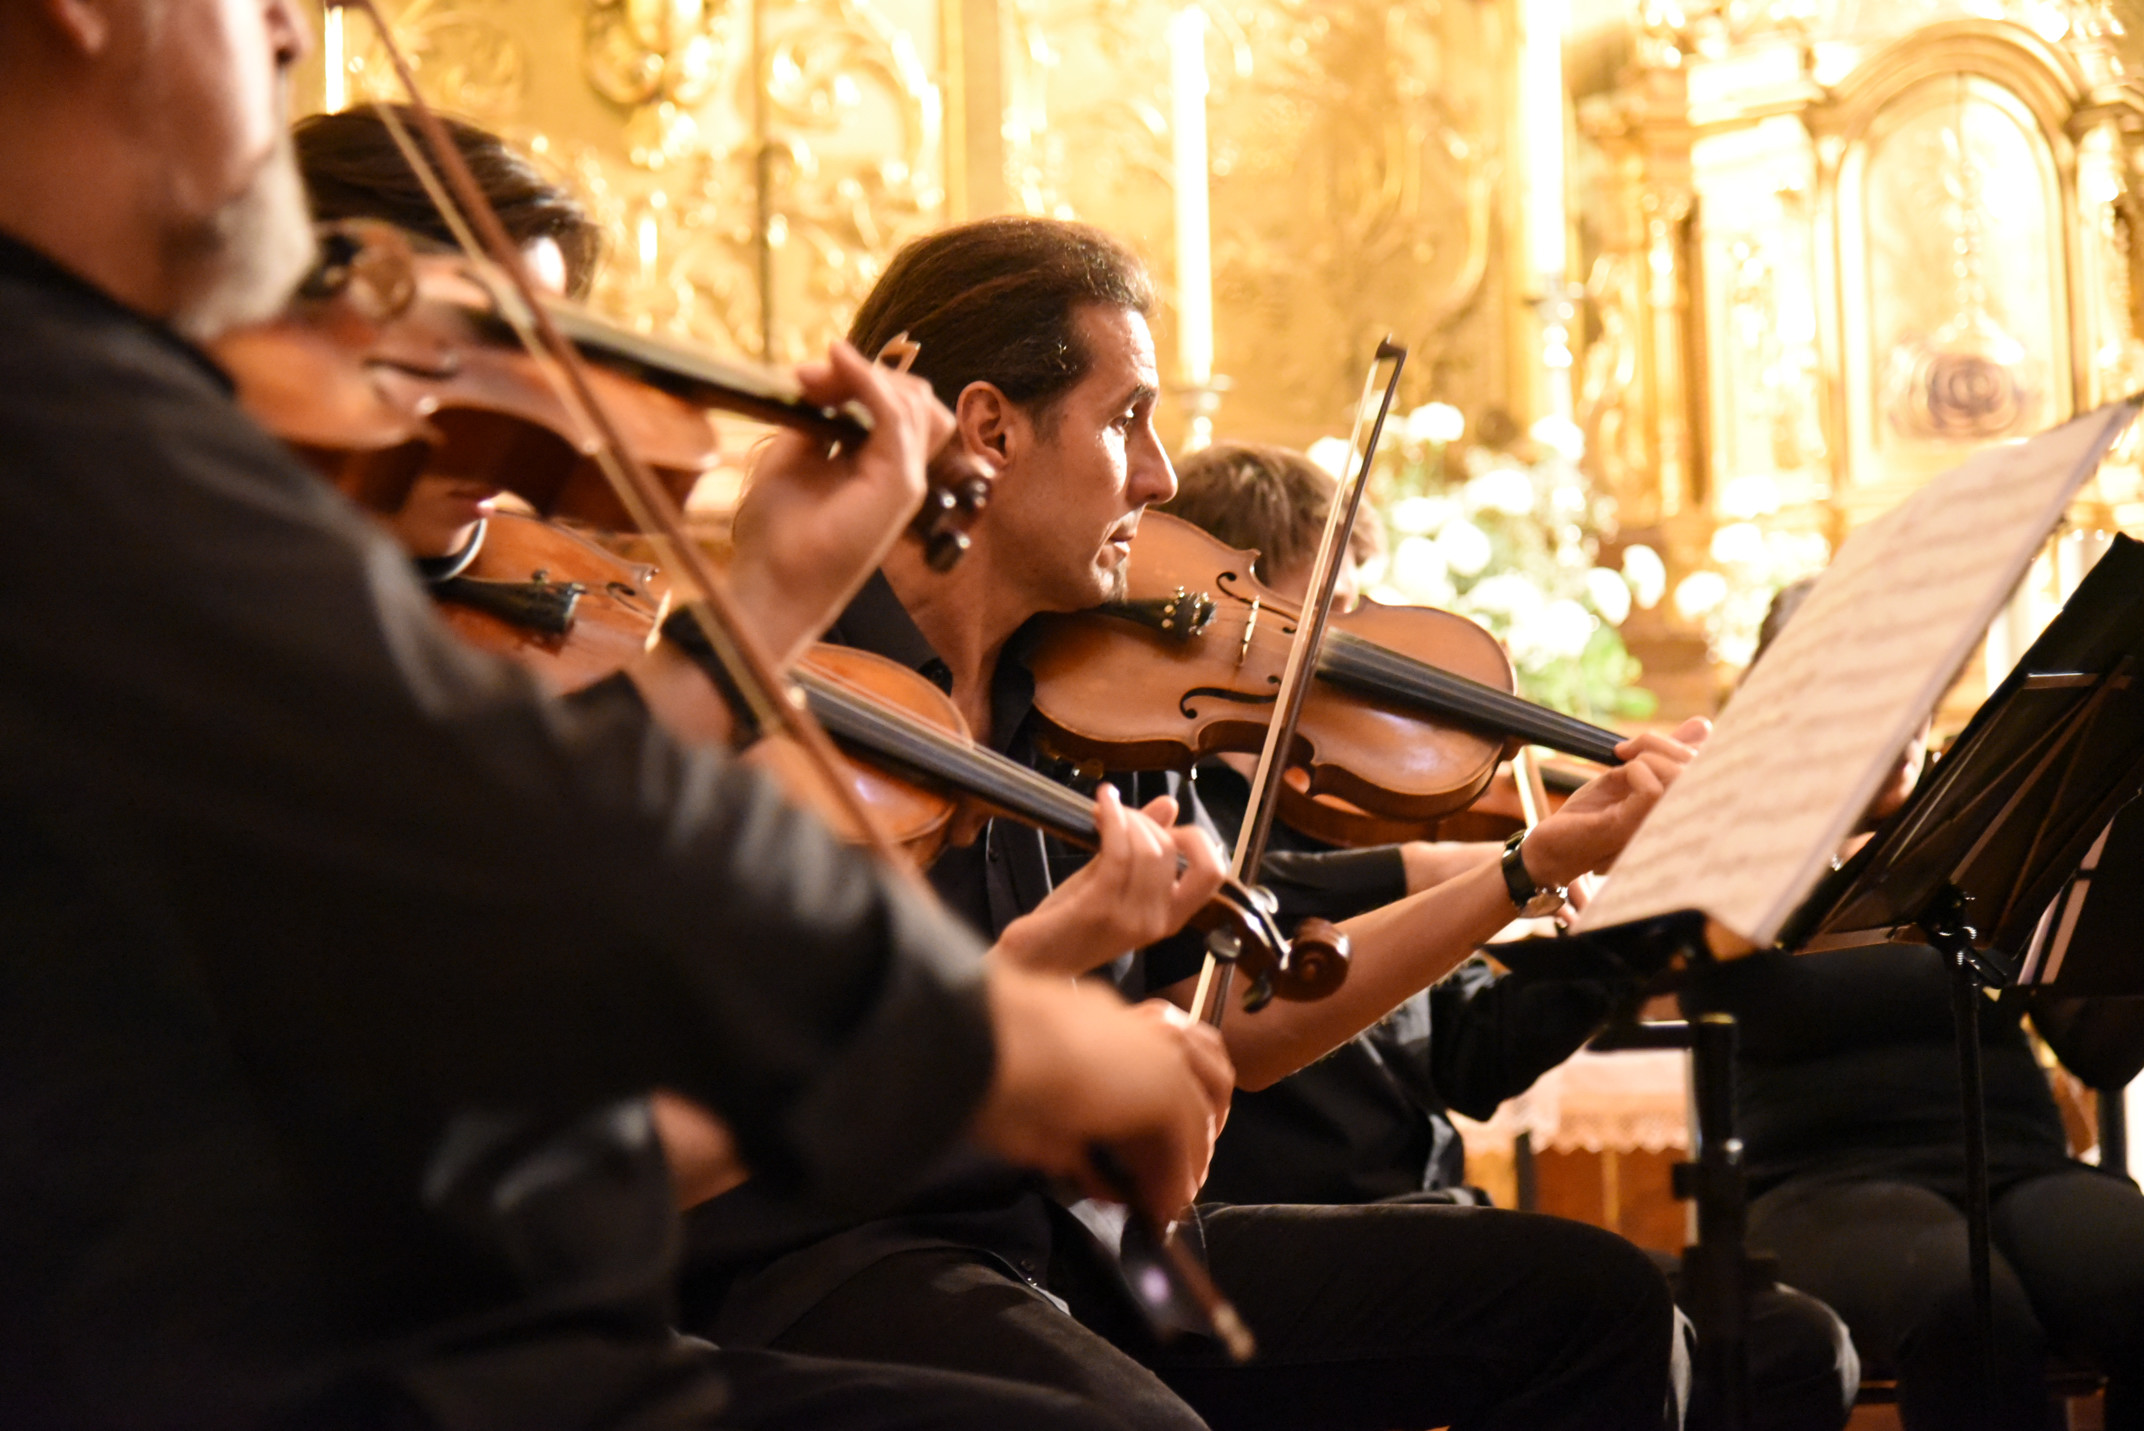 http://orquestatutti.com/wp/wp-content/uploads/2017/06/DSC_0264_14.jpg